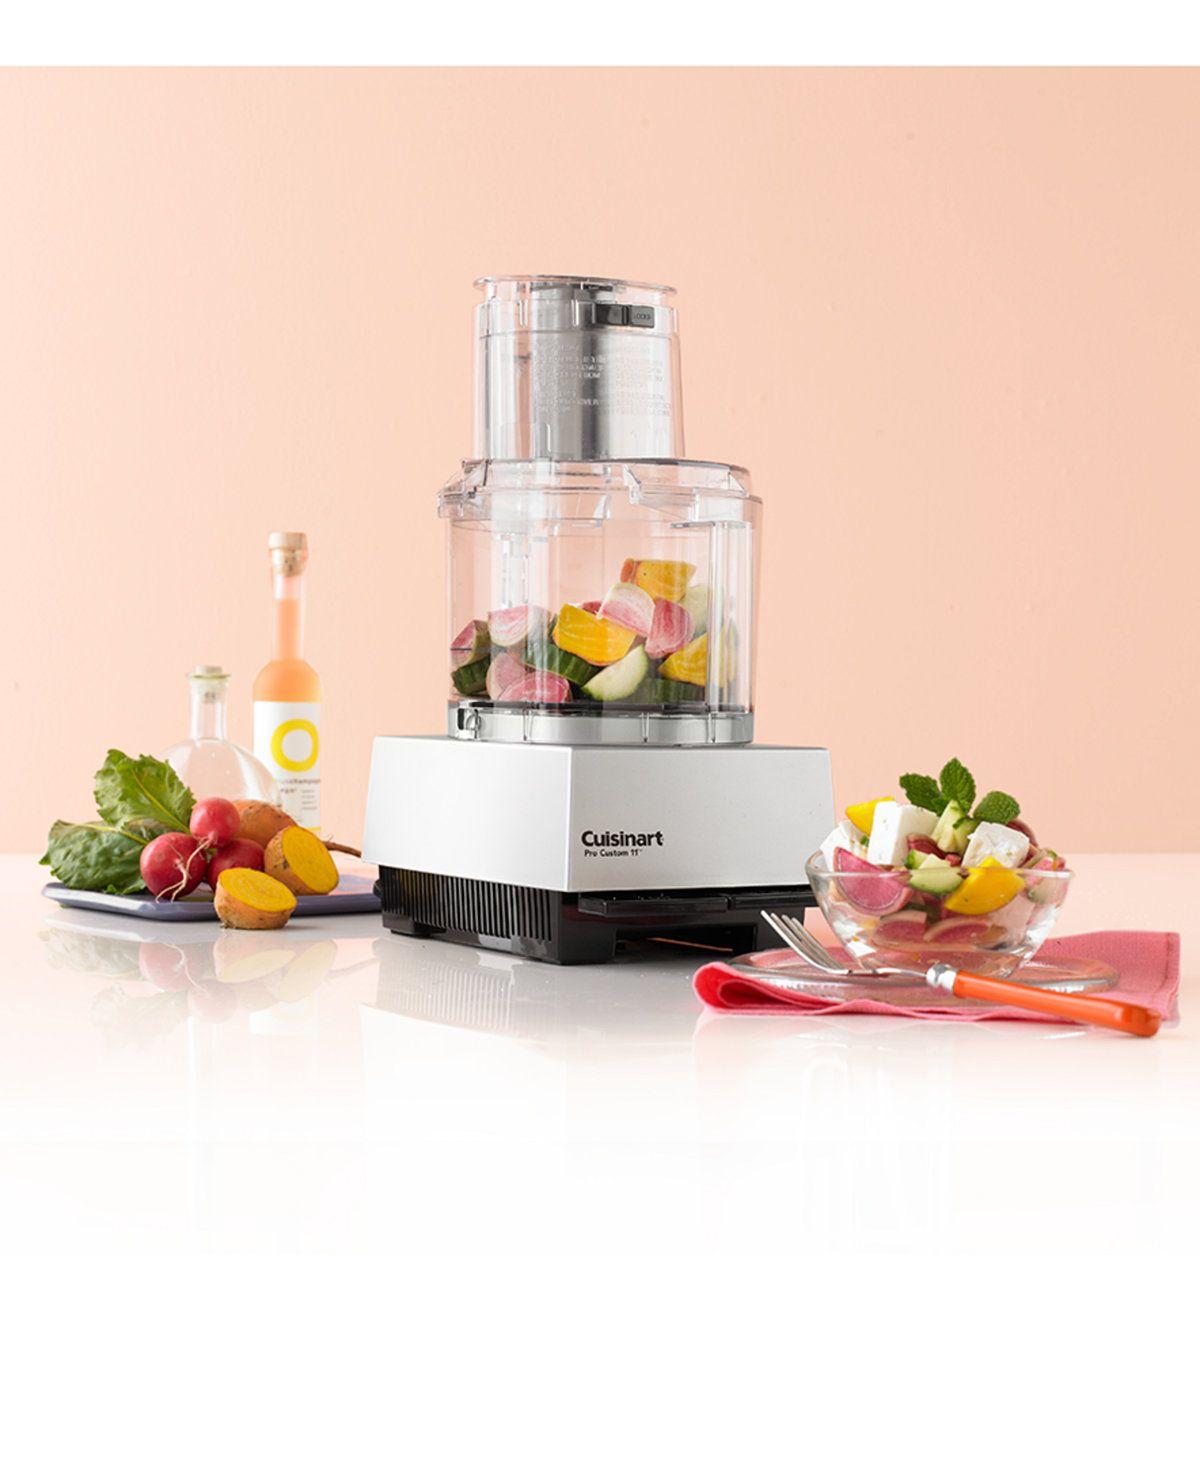 Cuisinart Dlc 8sbcy Pro Custom 11 11 Cup Food Processor Reviews Small Appliances Kitchen Macy S Food Processor Recipes Food Processor Reviews Food